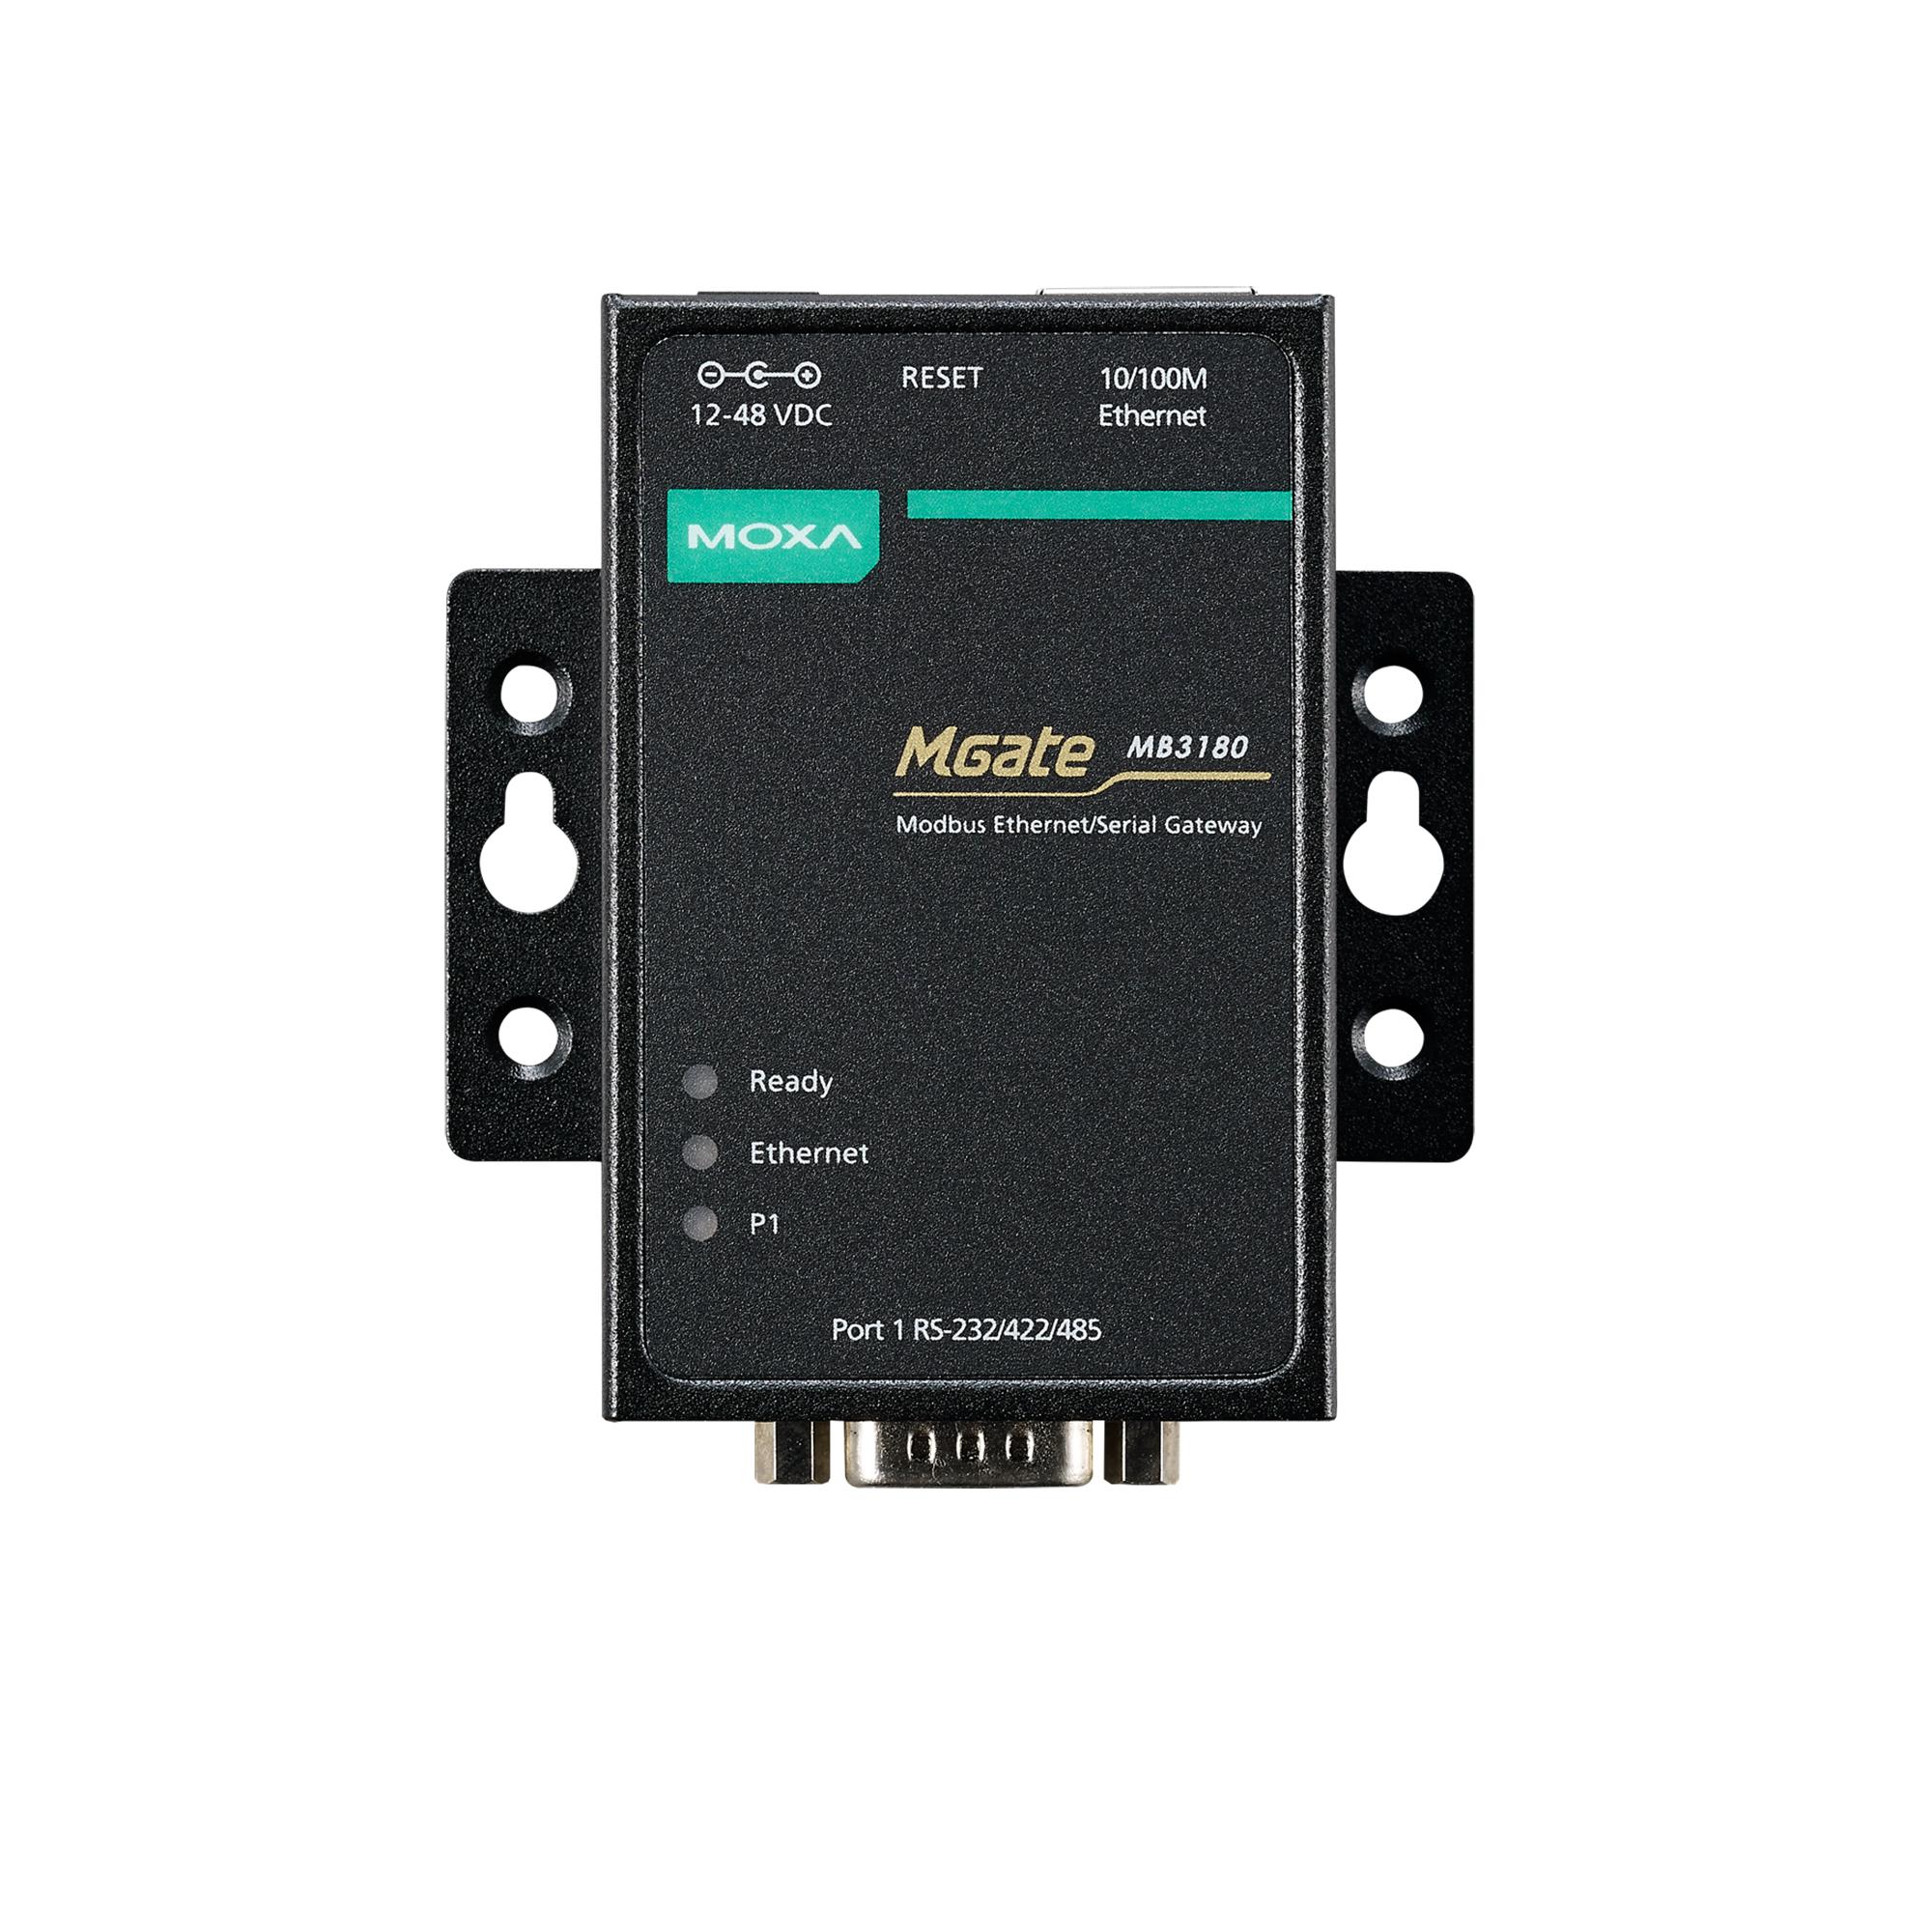 MGate MB3180/MB3280/MB3480 Series - Modbus TCP Gateways | MOXA